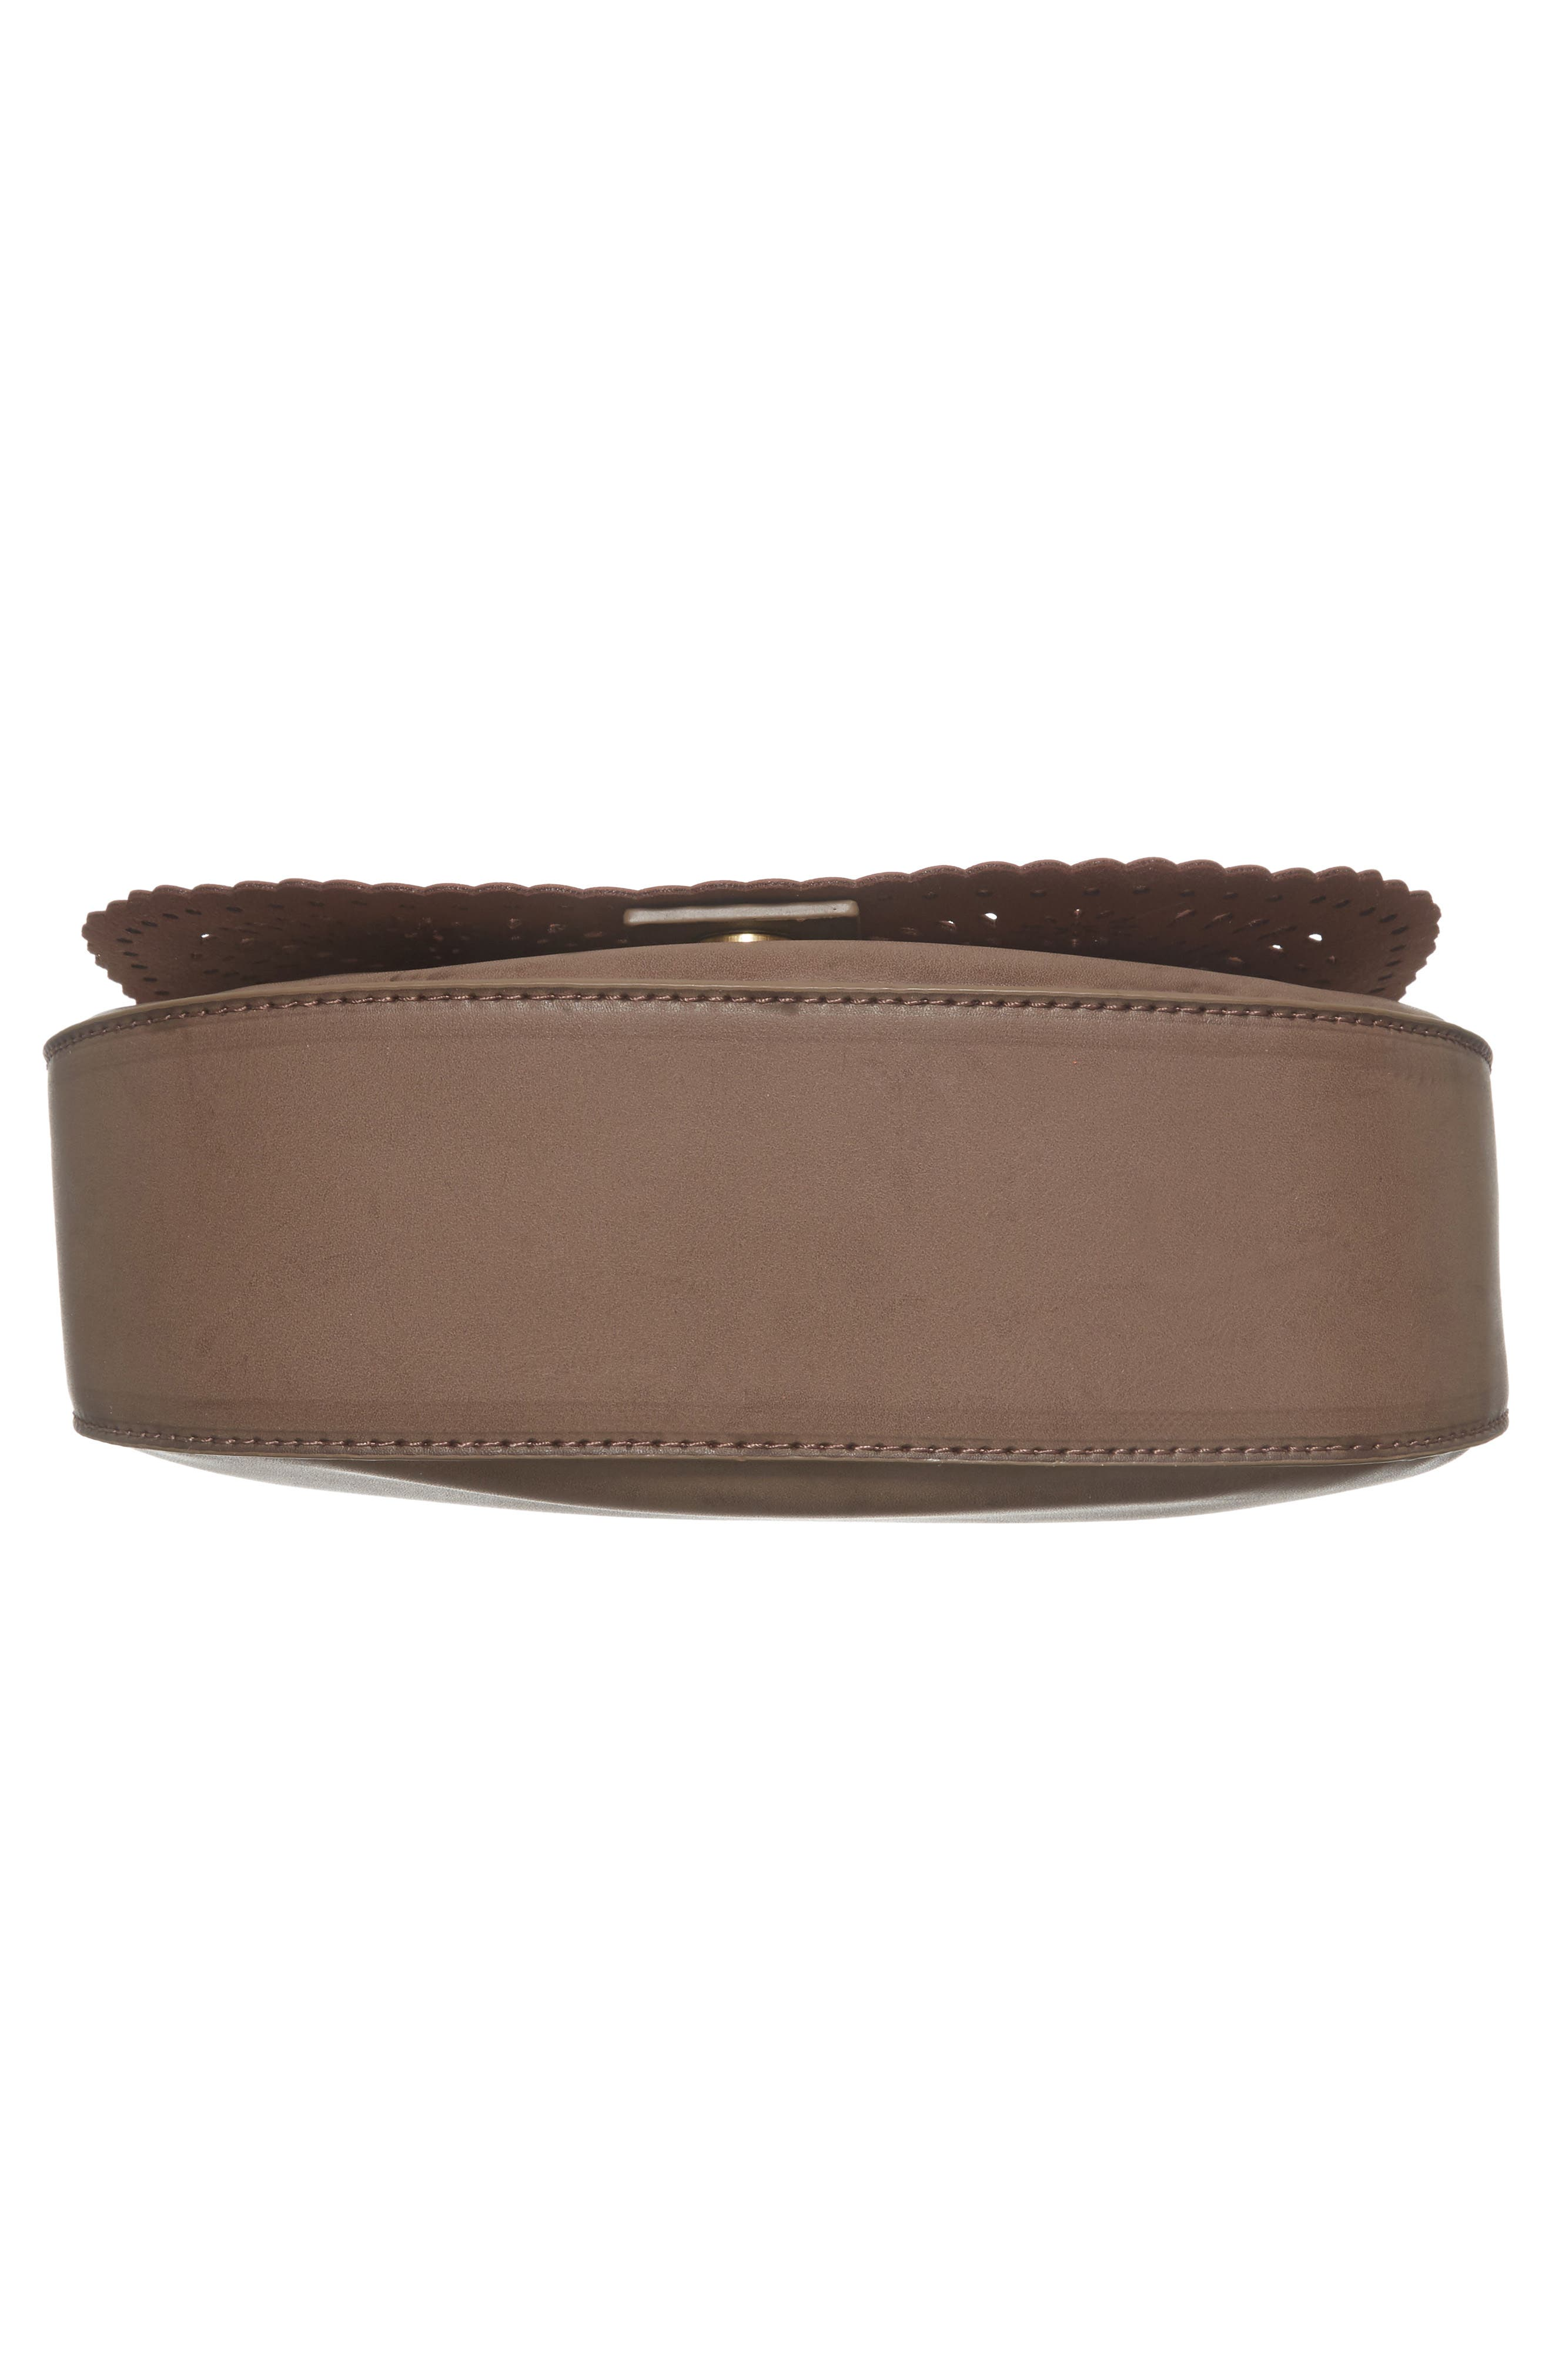 Dakota Faux Leather Saddle Bag,                             Alternate thumbnail 6, color,                             022